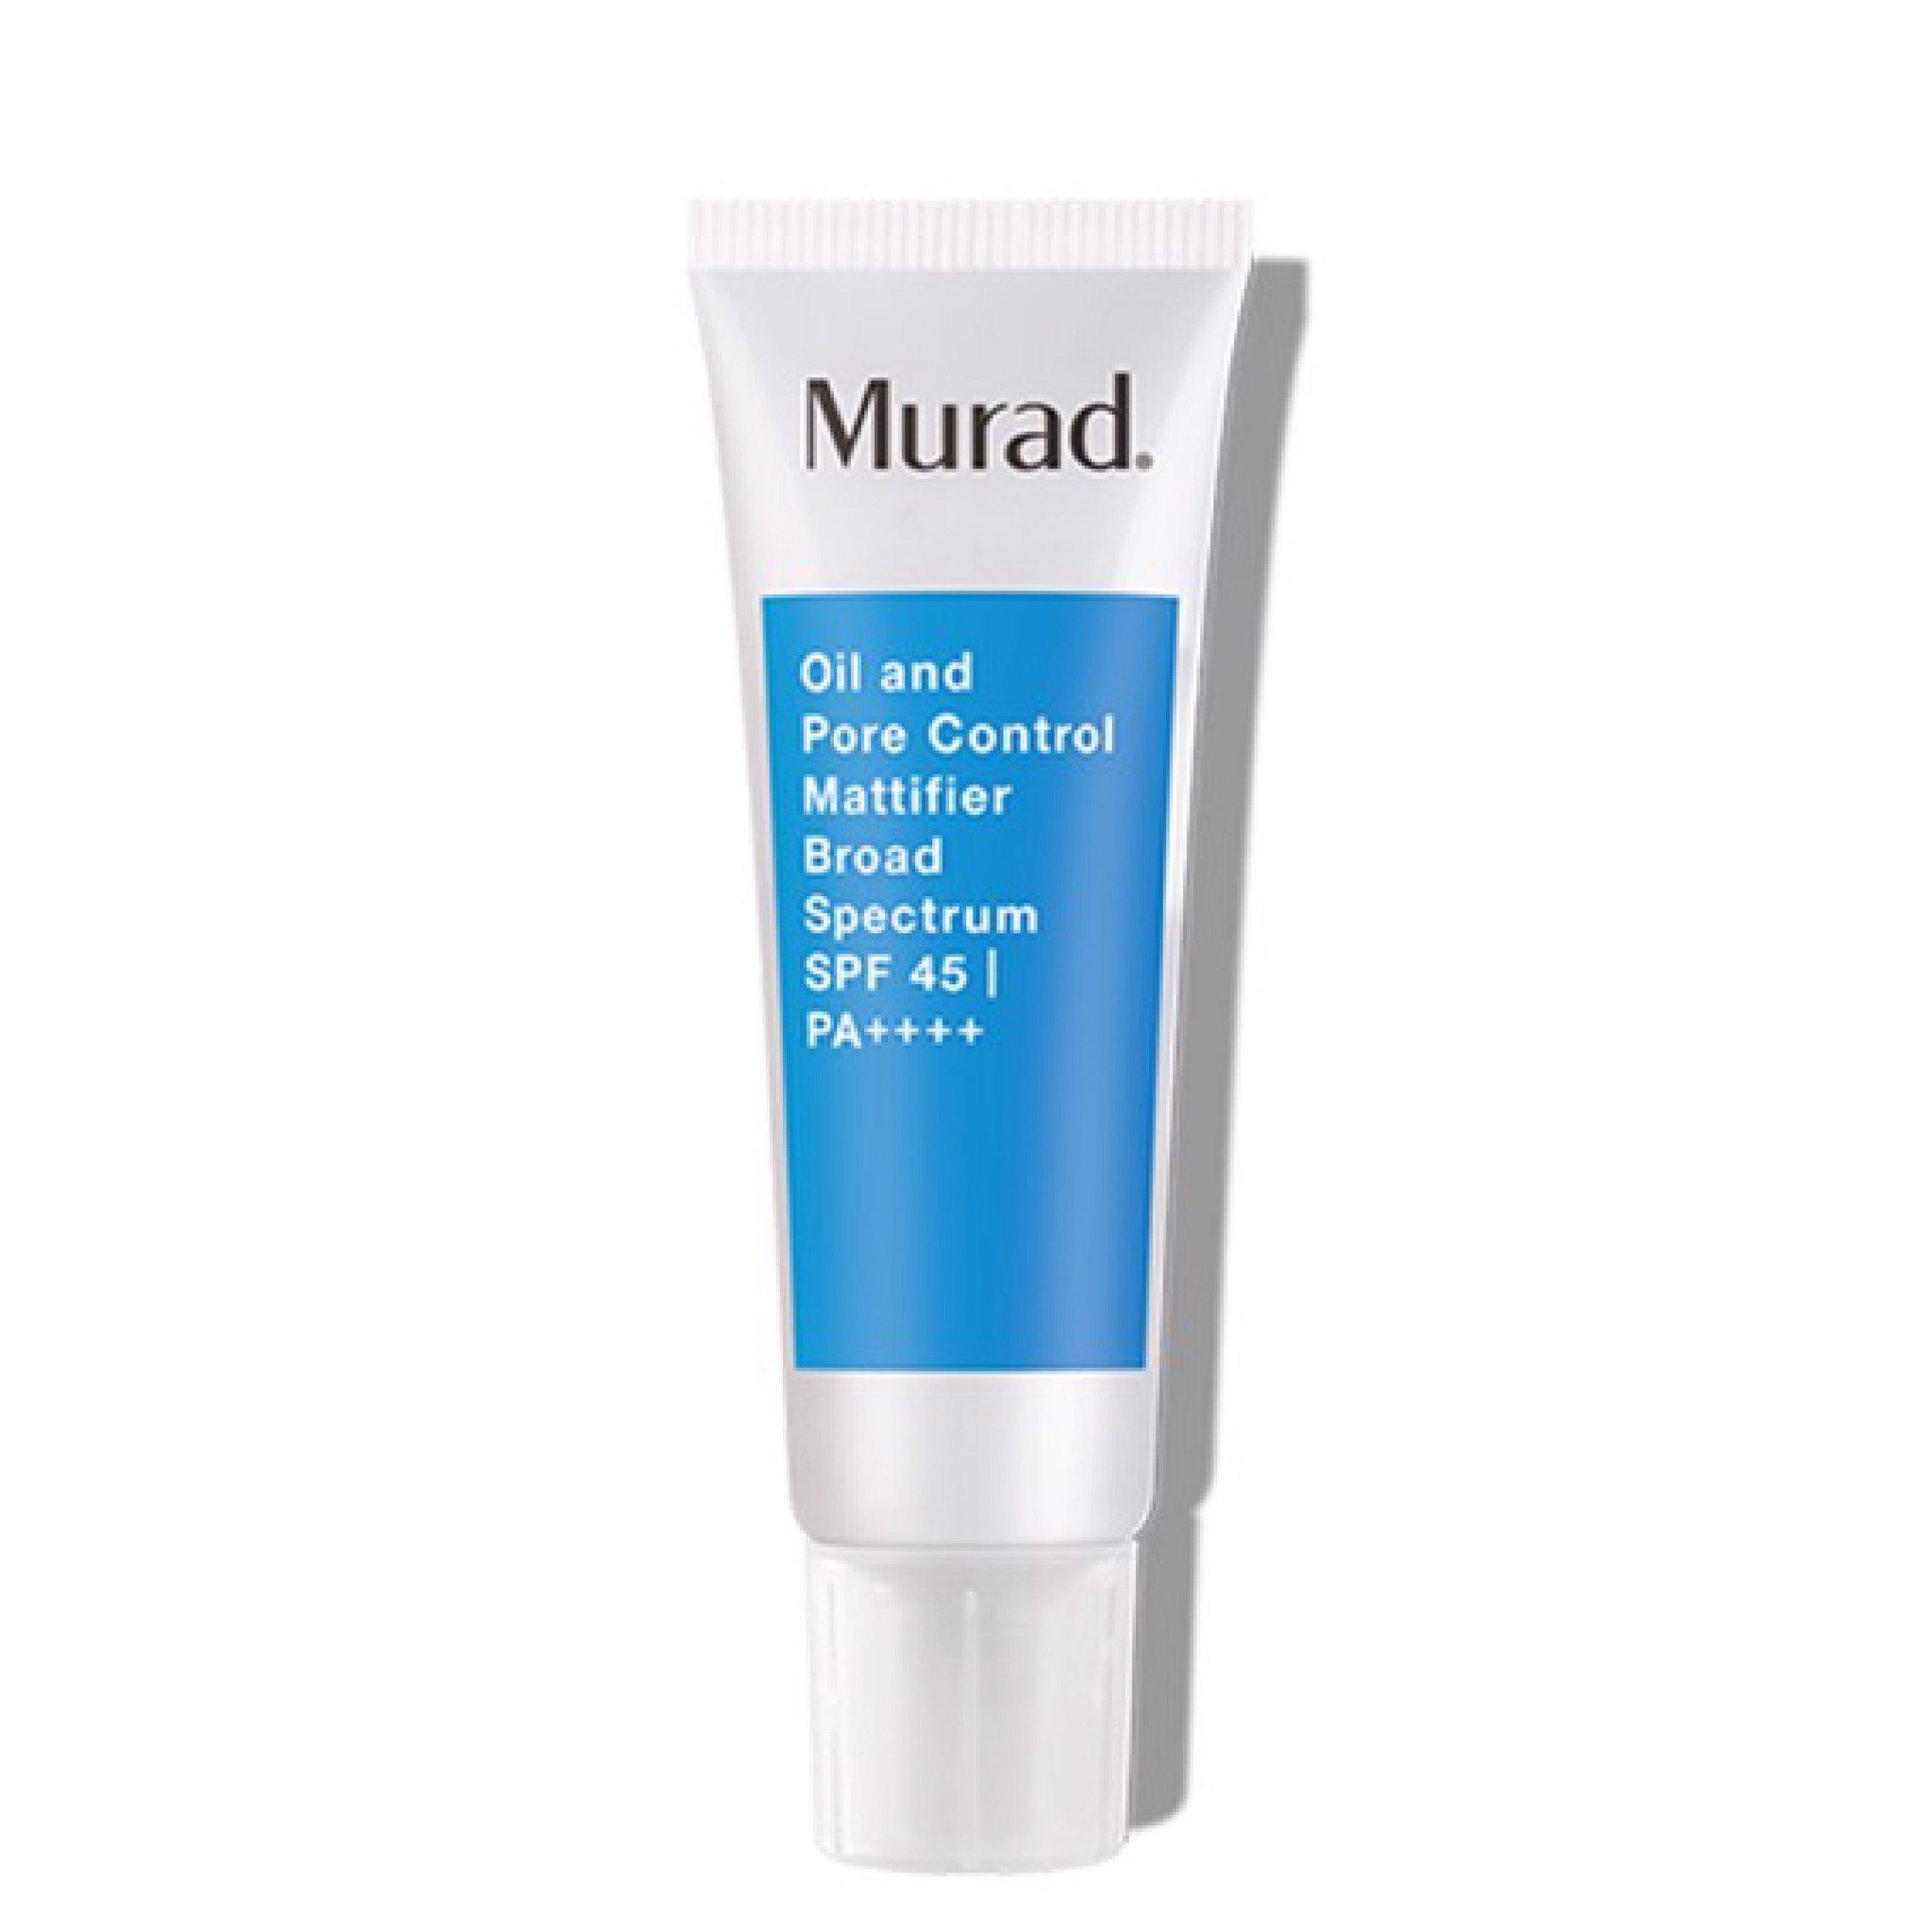 Kem chống nắng kiềm dầu Murad Oil And Pore Control